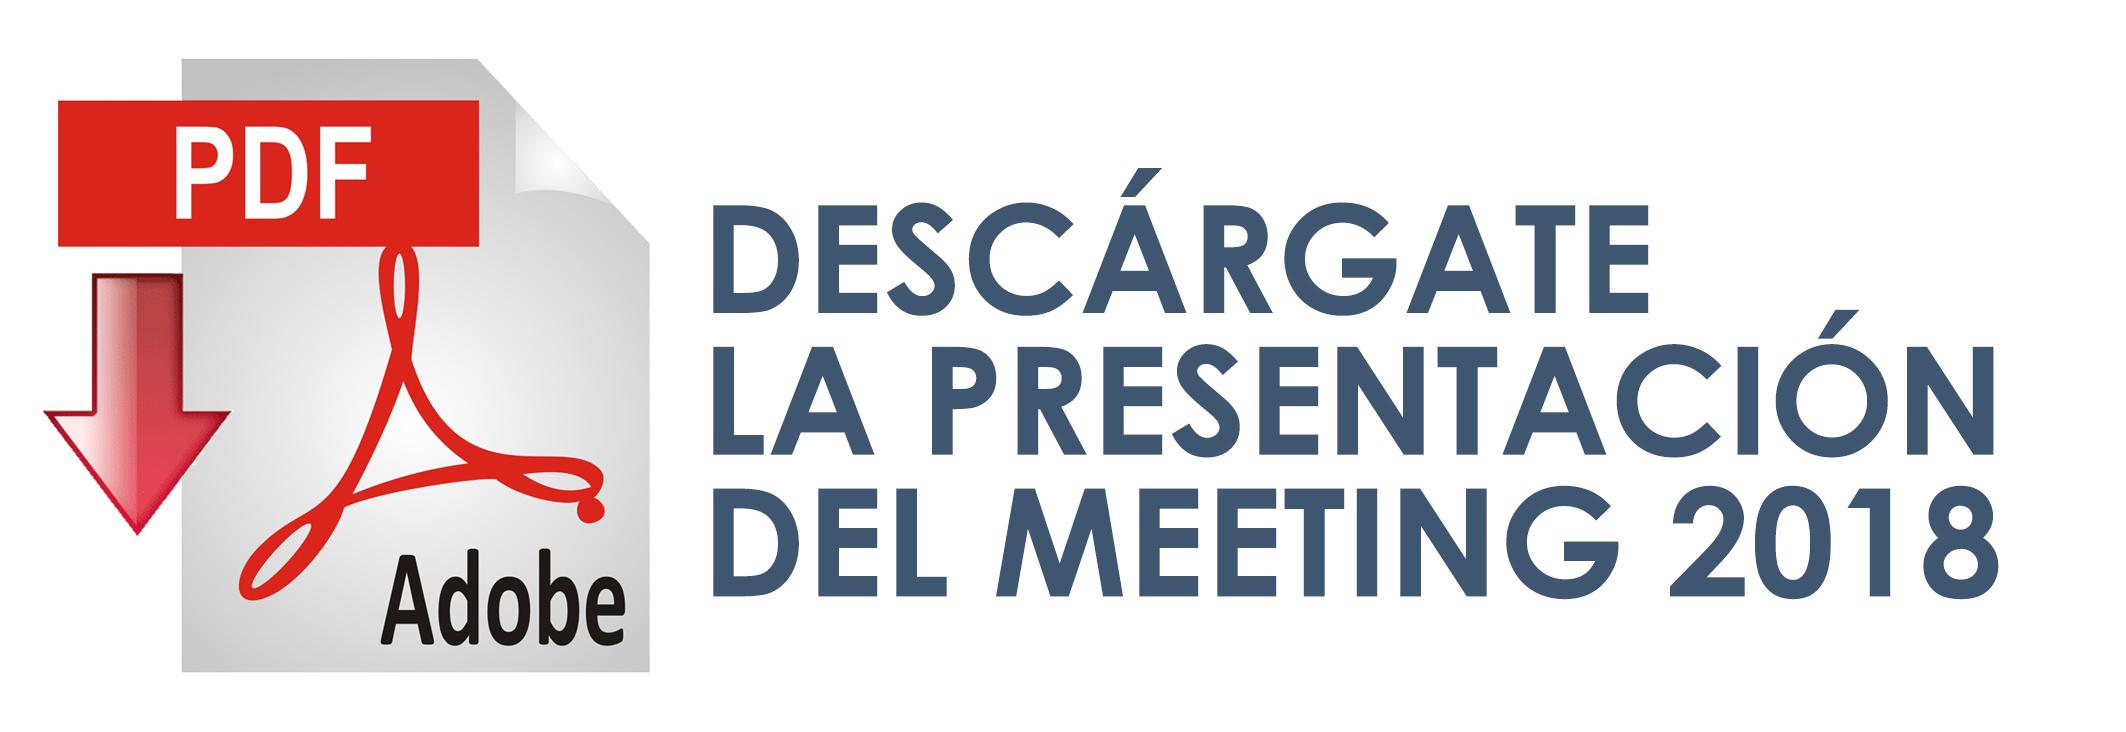 pdf_presentacion2018